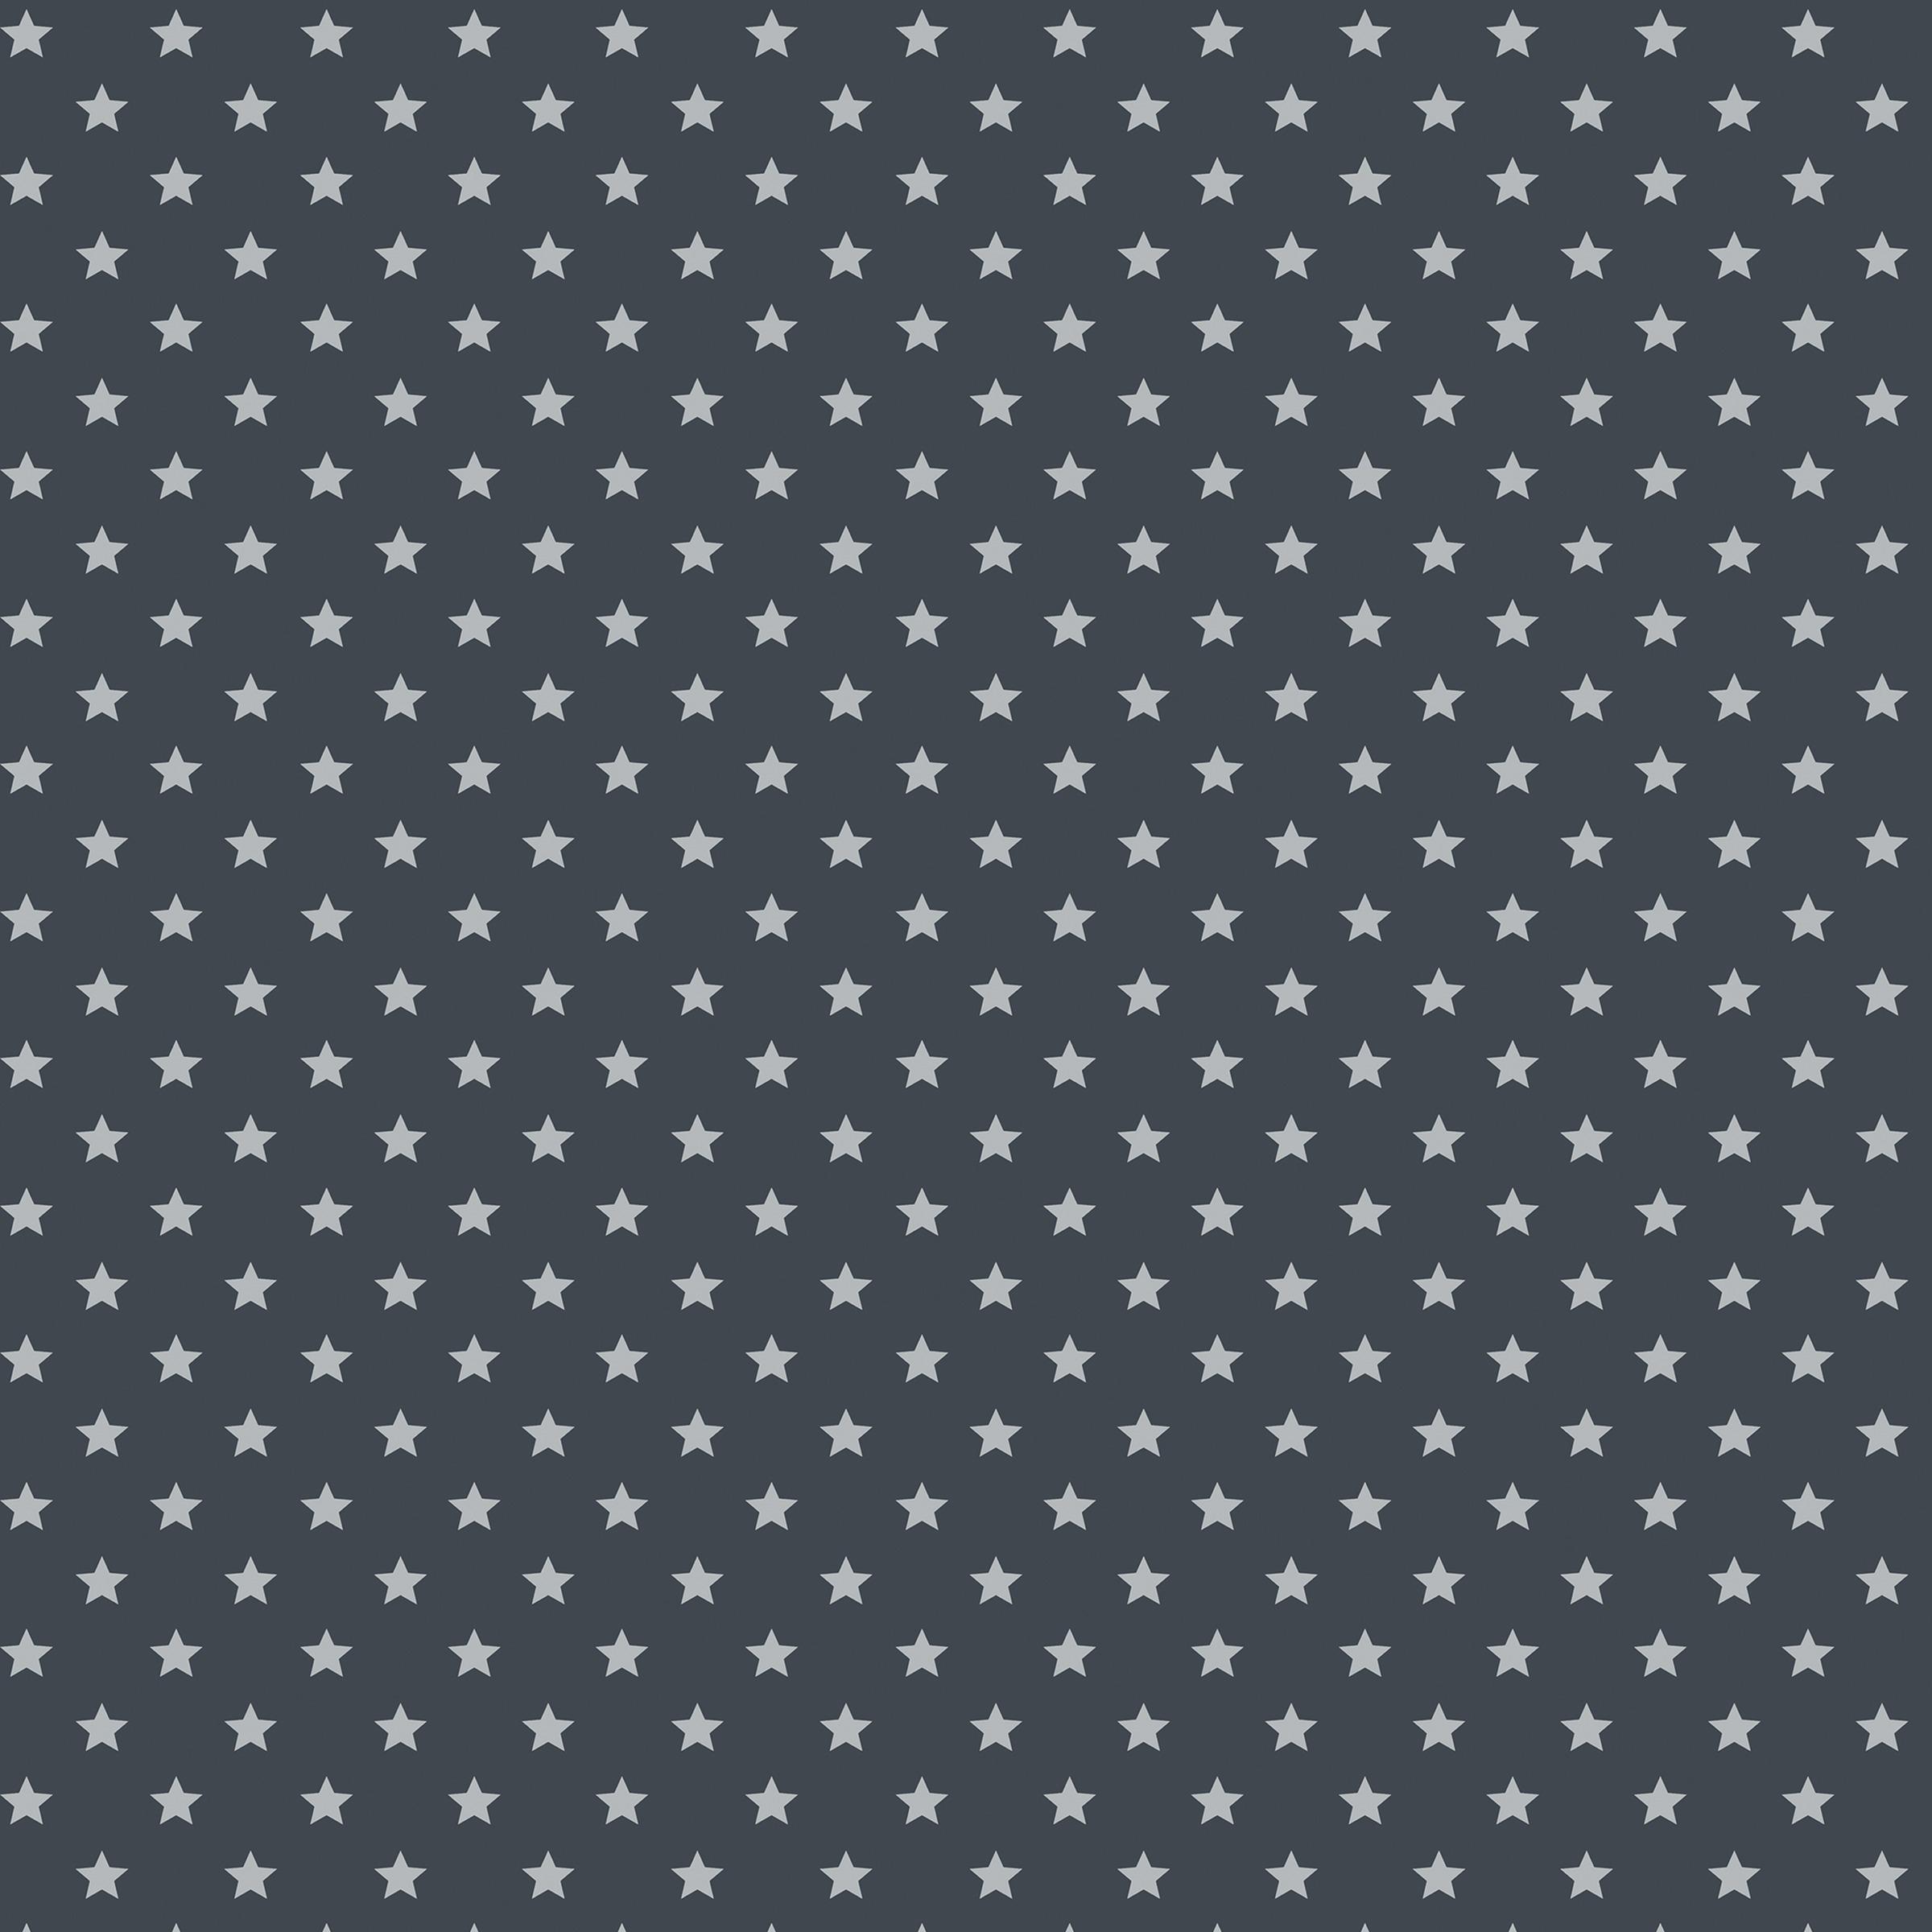 dc fix decoratie folie grijs ster 346 0653 2 m x 45 cm raamfolie plakfolie raamdecoratie. Black Bedroom Furniture Sets. Home Design Ideas